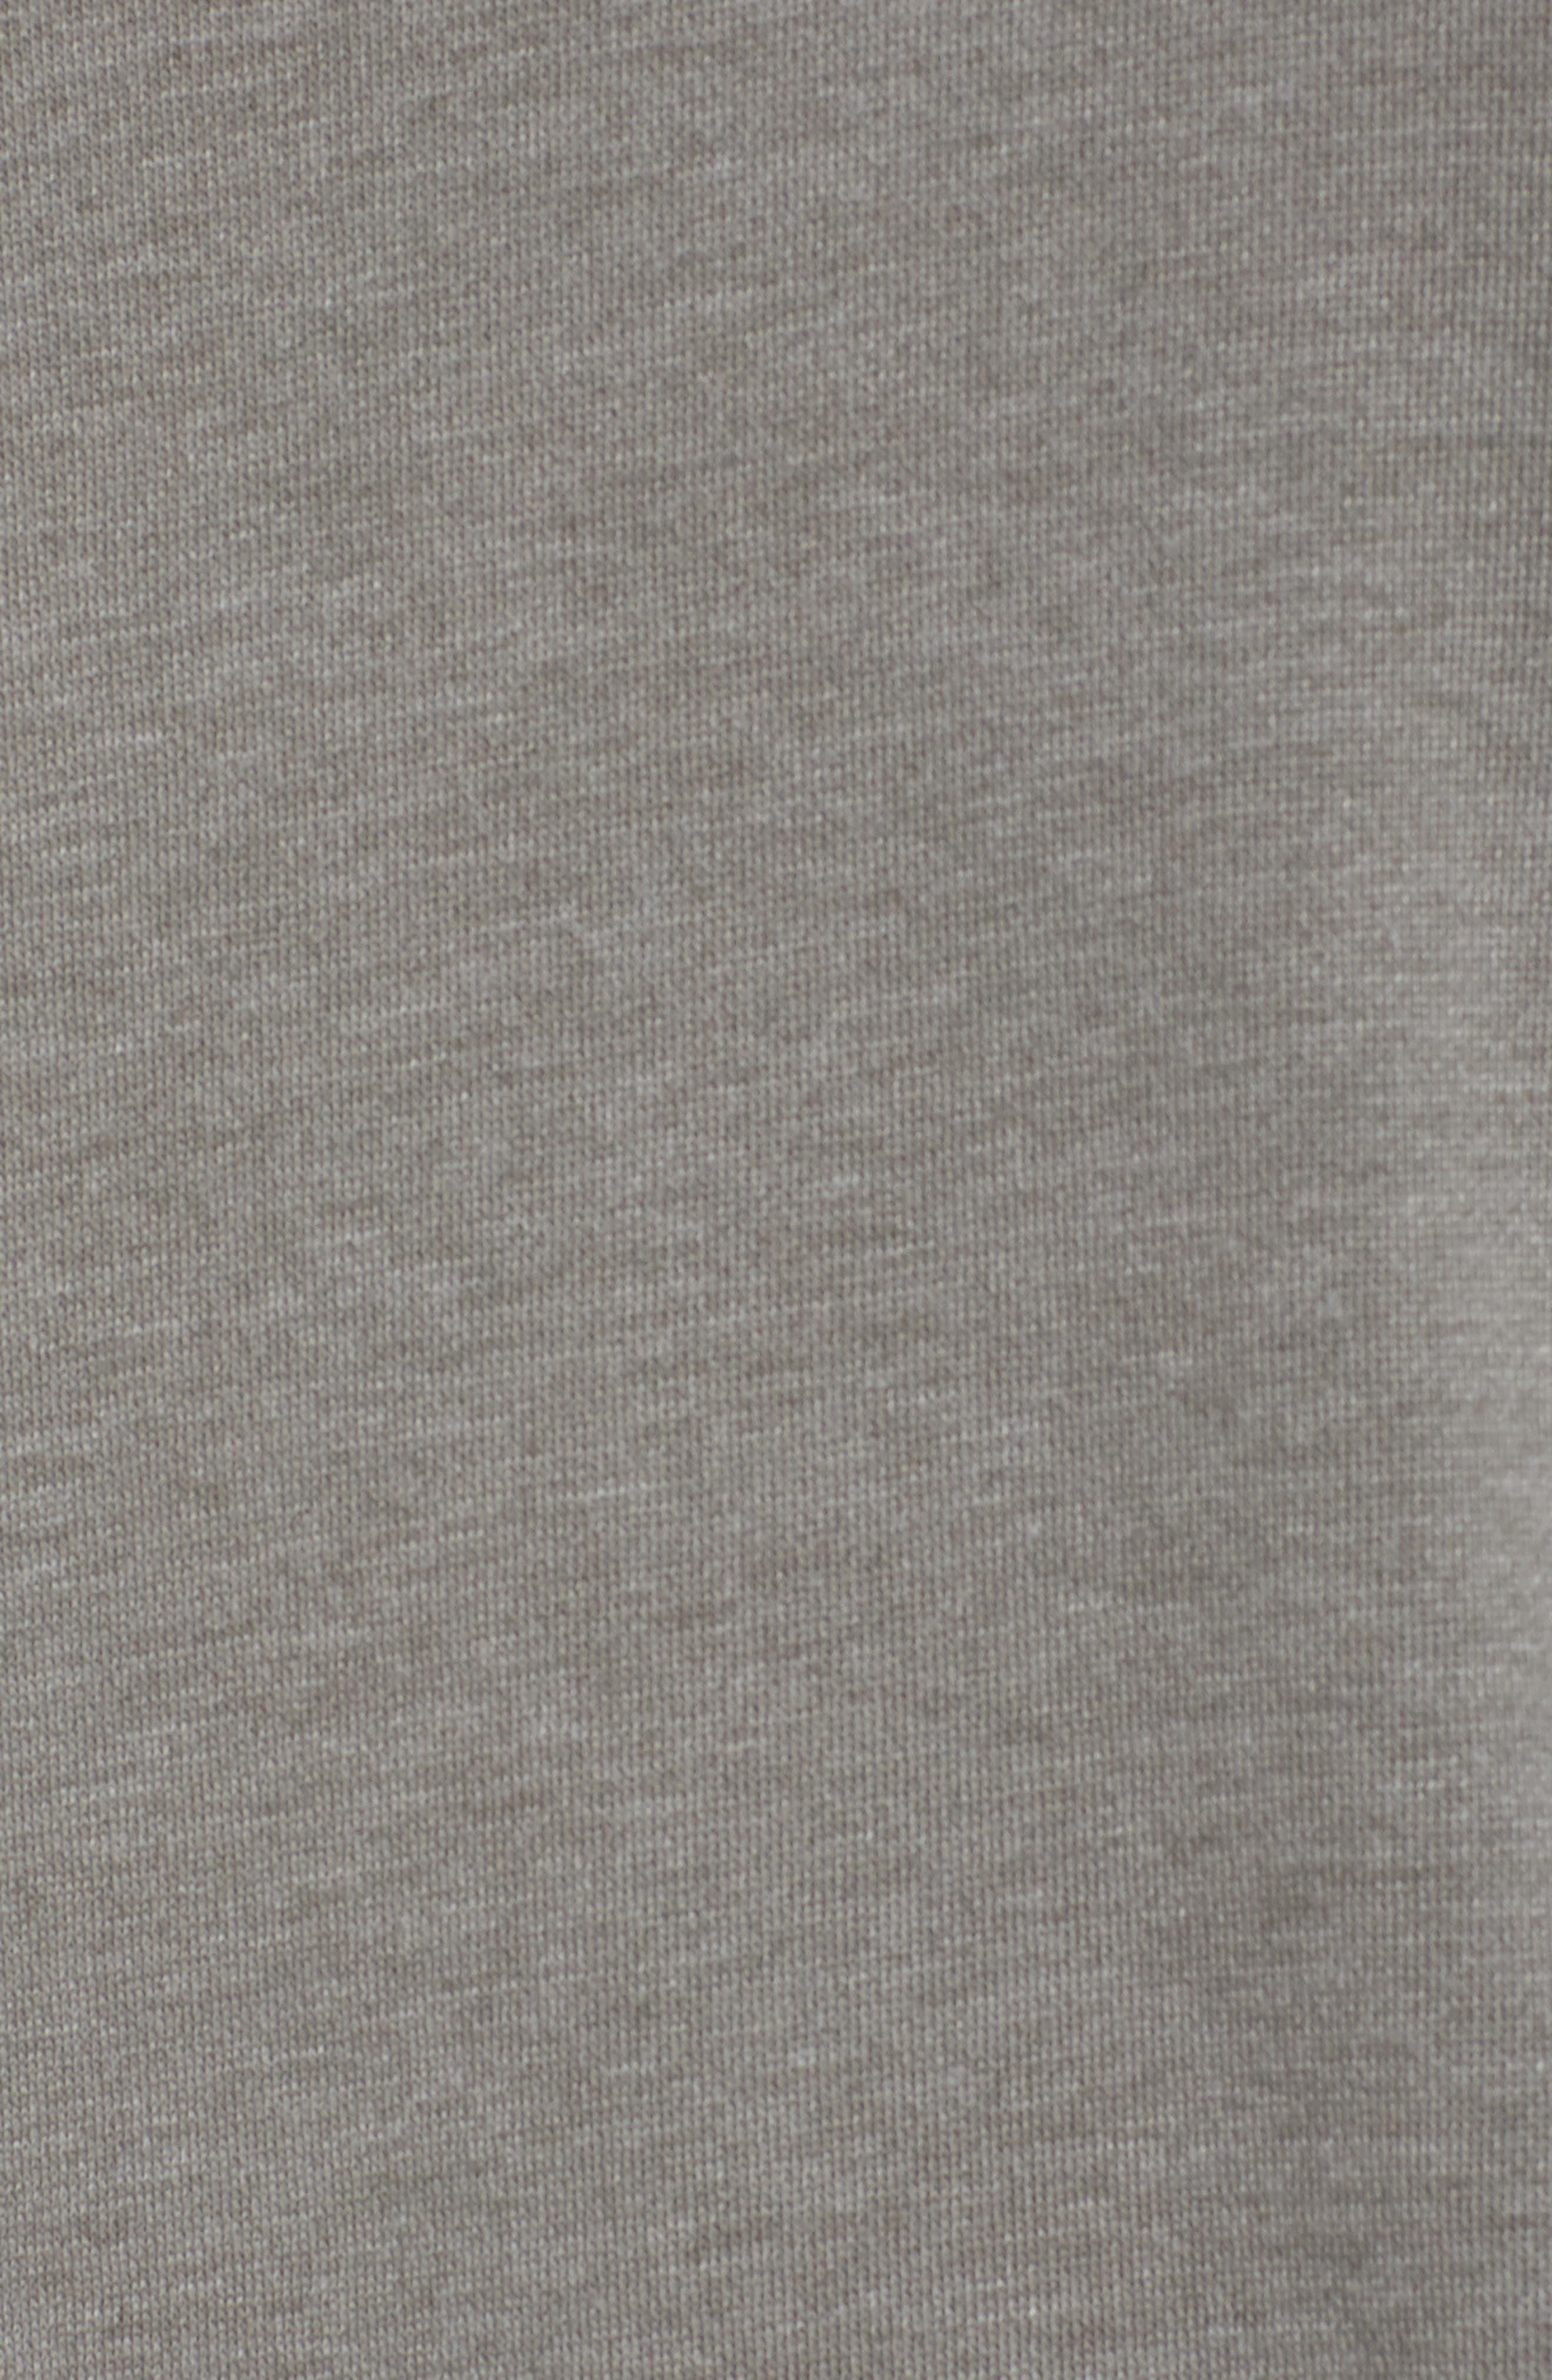 Lounge Sweatshirt Dress,                             Alternate thumbnail 5, color,                             001